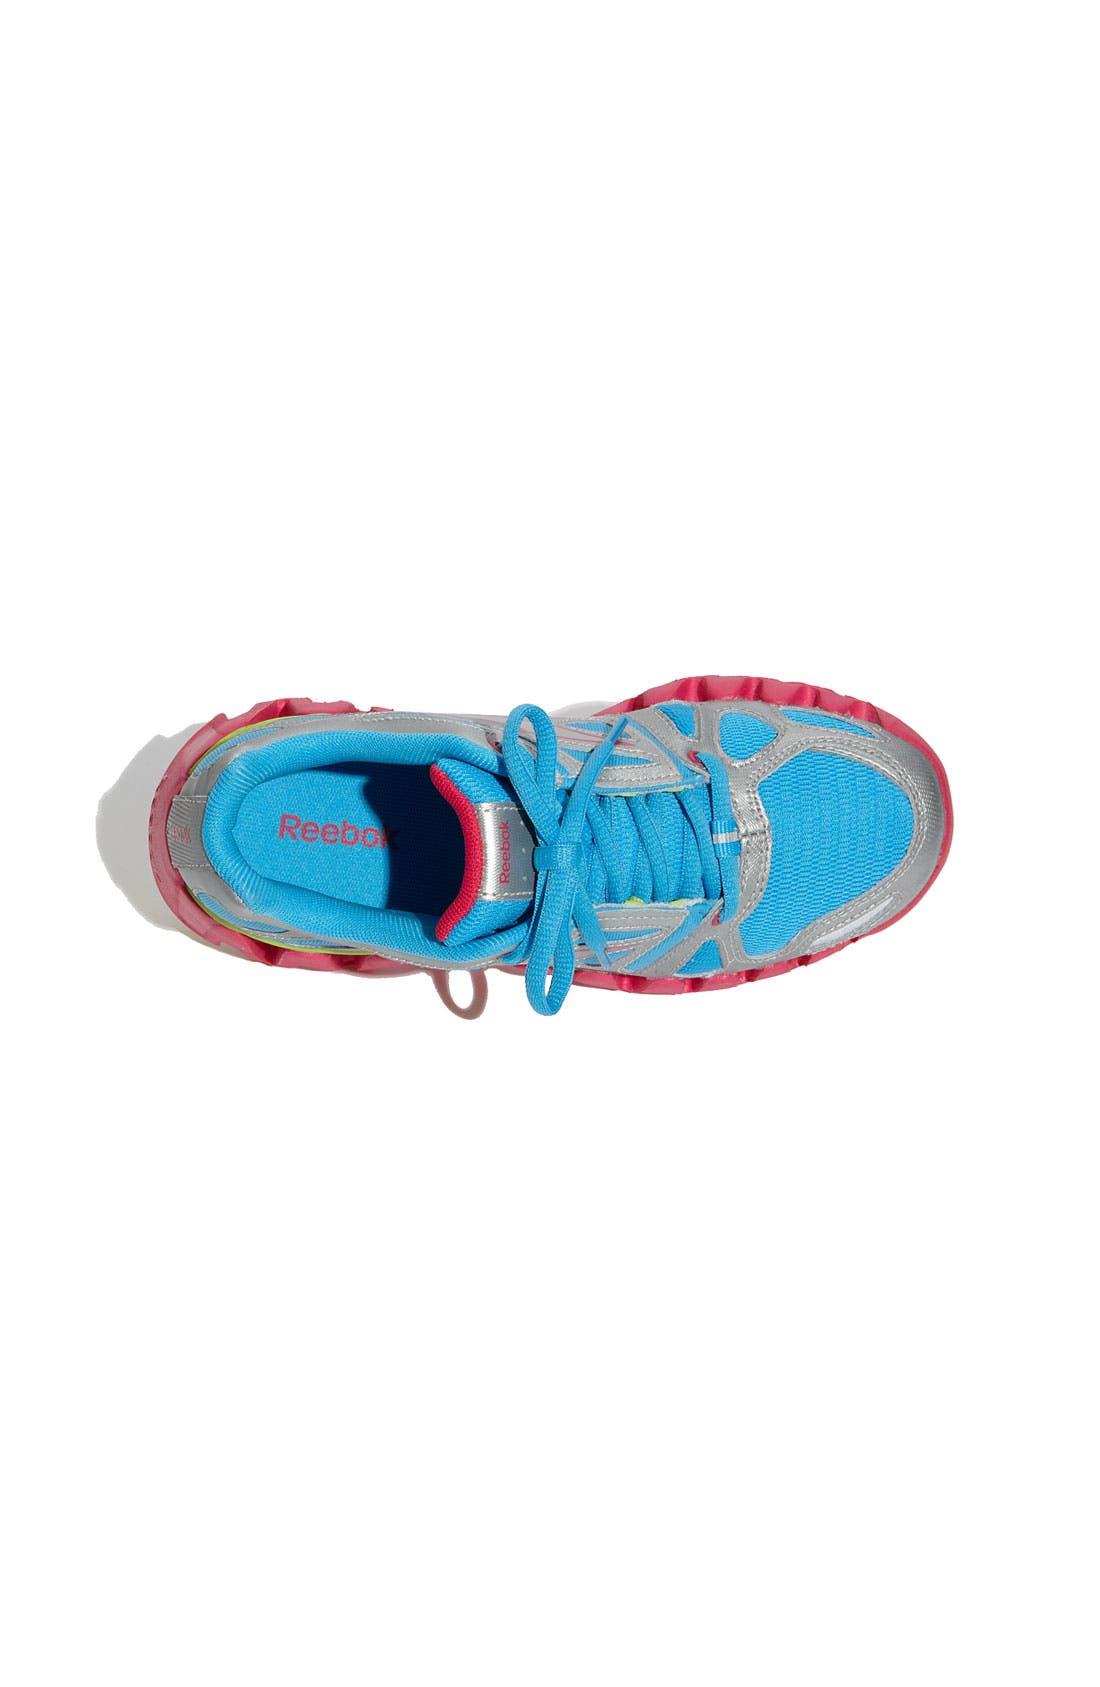 Alternate Image 3  - Reebok 'Zig Dynamic' Running Shoe (Baby, Walker, Toddler, Little Kid & Big Kid)